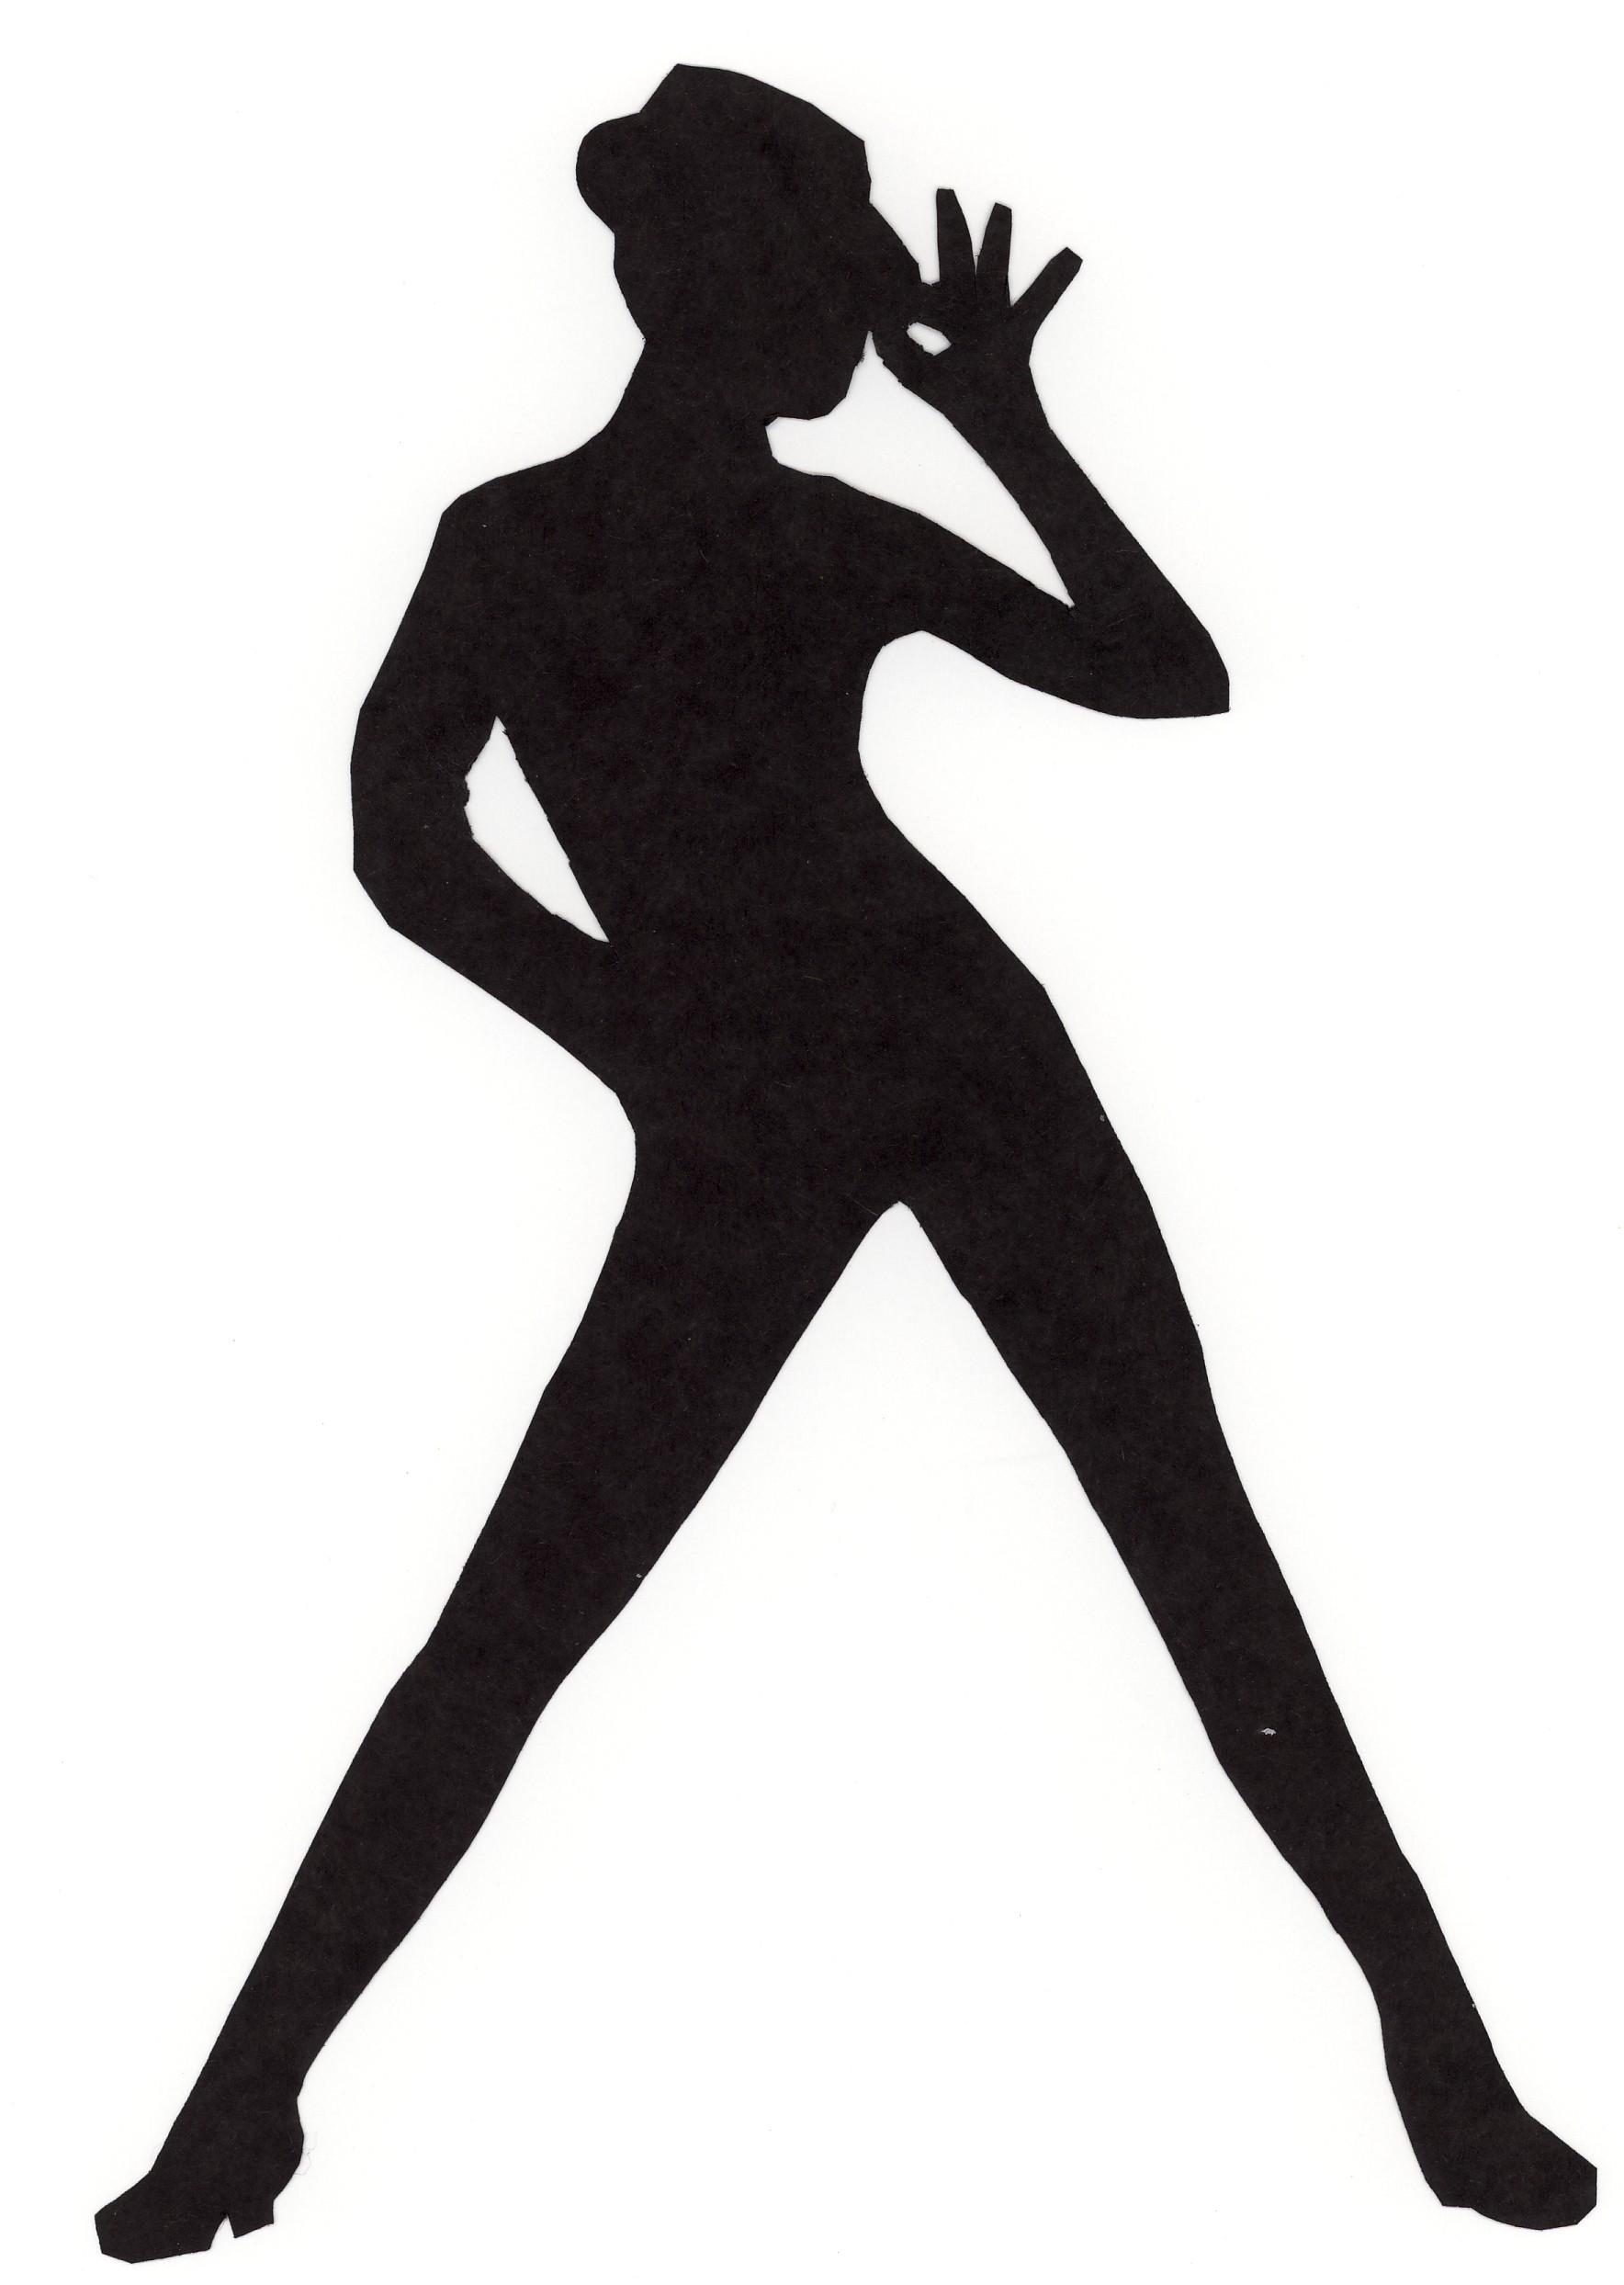 1768x2487 Jazz Dancer Png Silhouette Transparent Jazz Dancer Silhouette.png